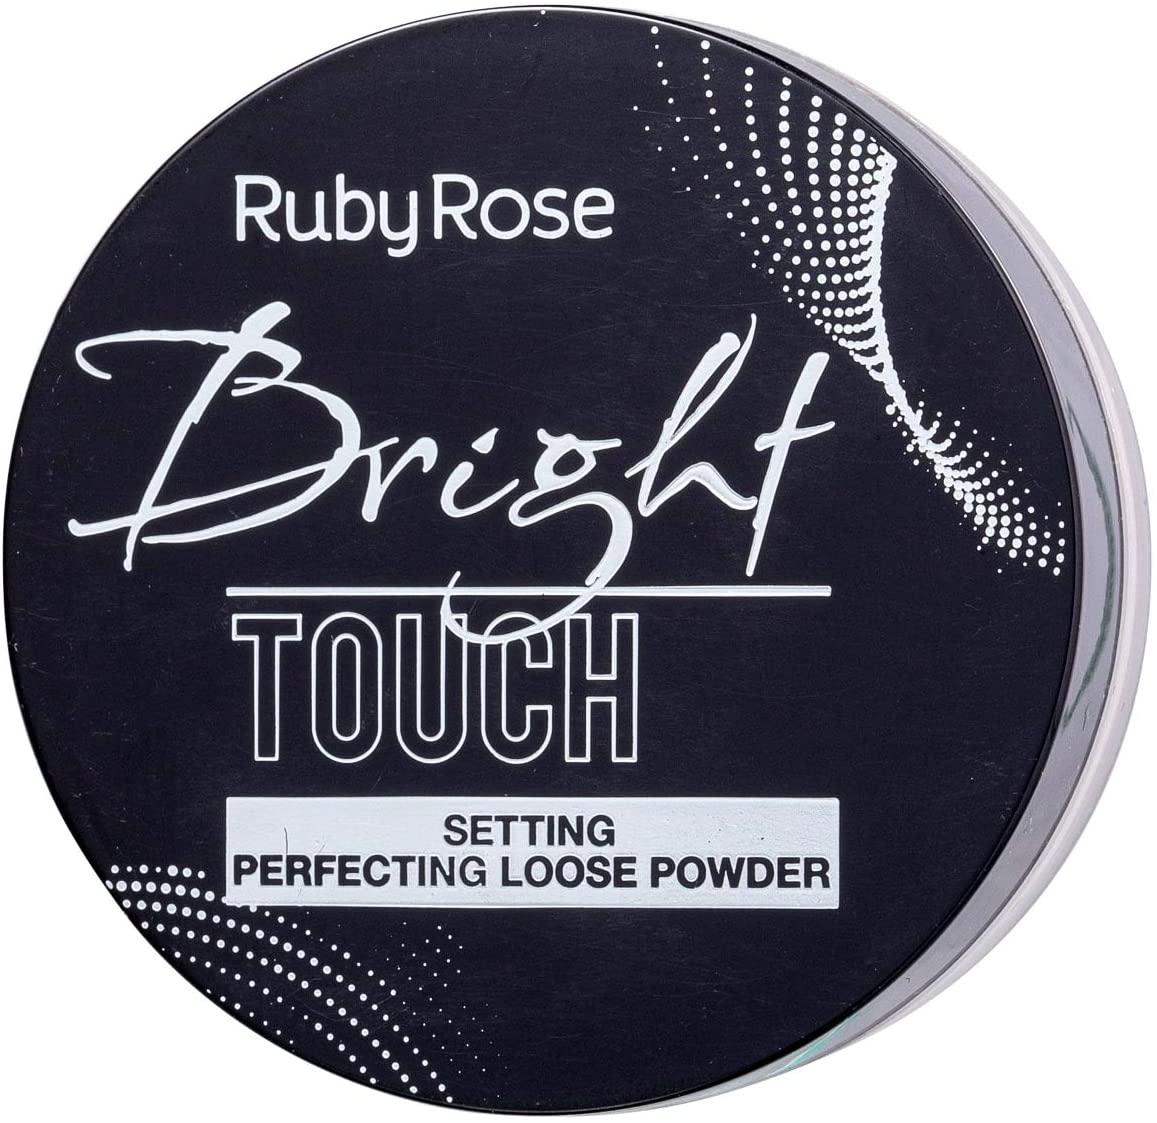 Pó Solto Bright Touch Neutro Claro 8,5g - Ruby Rose